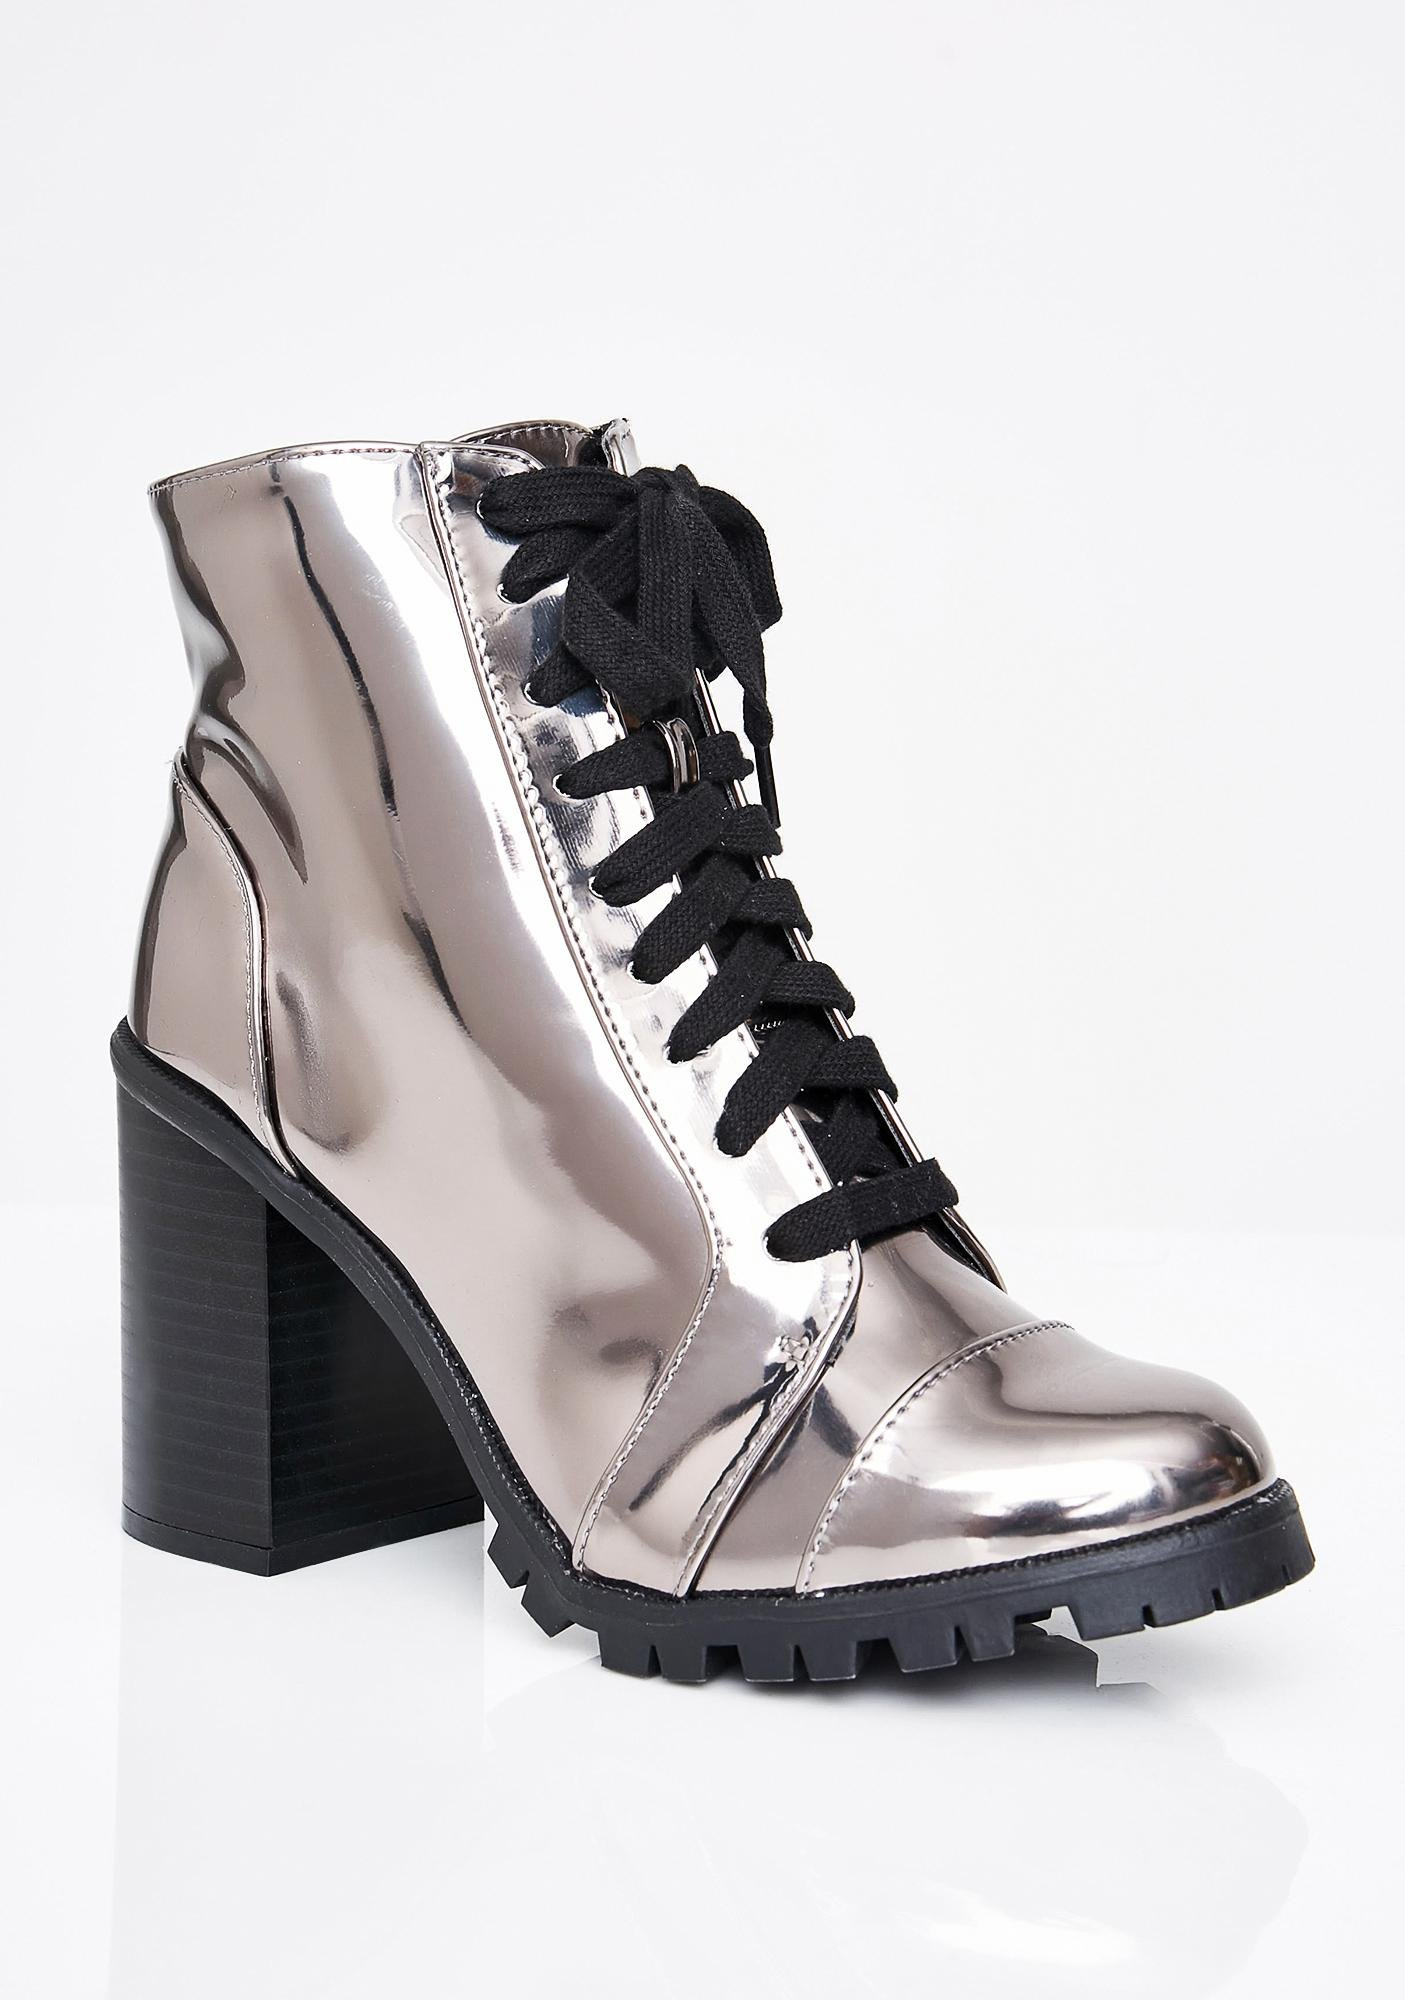 Fast Life Metallic Boots